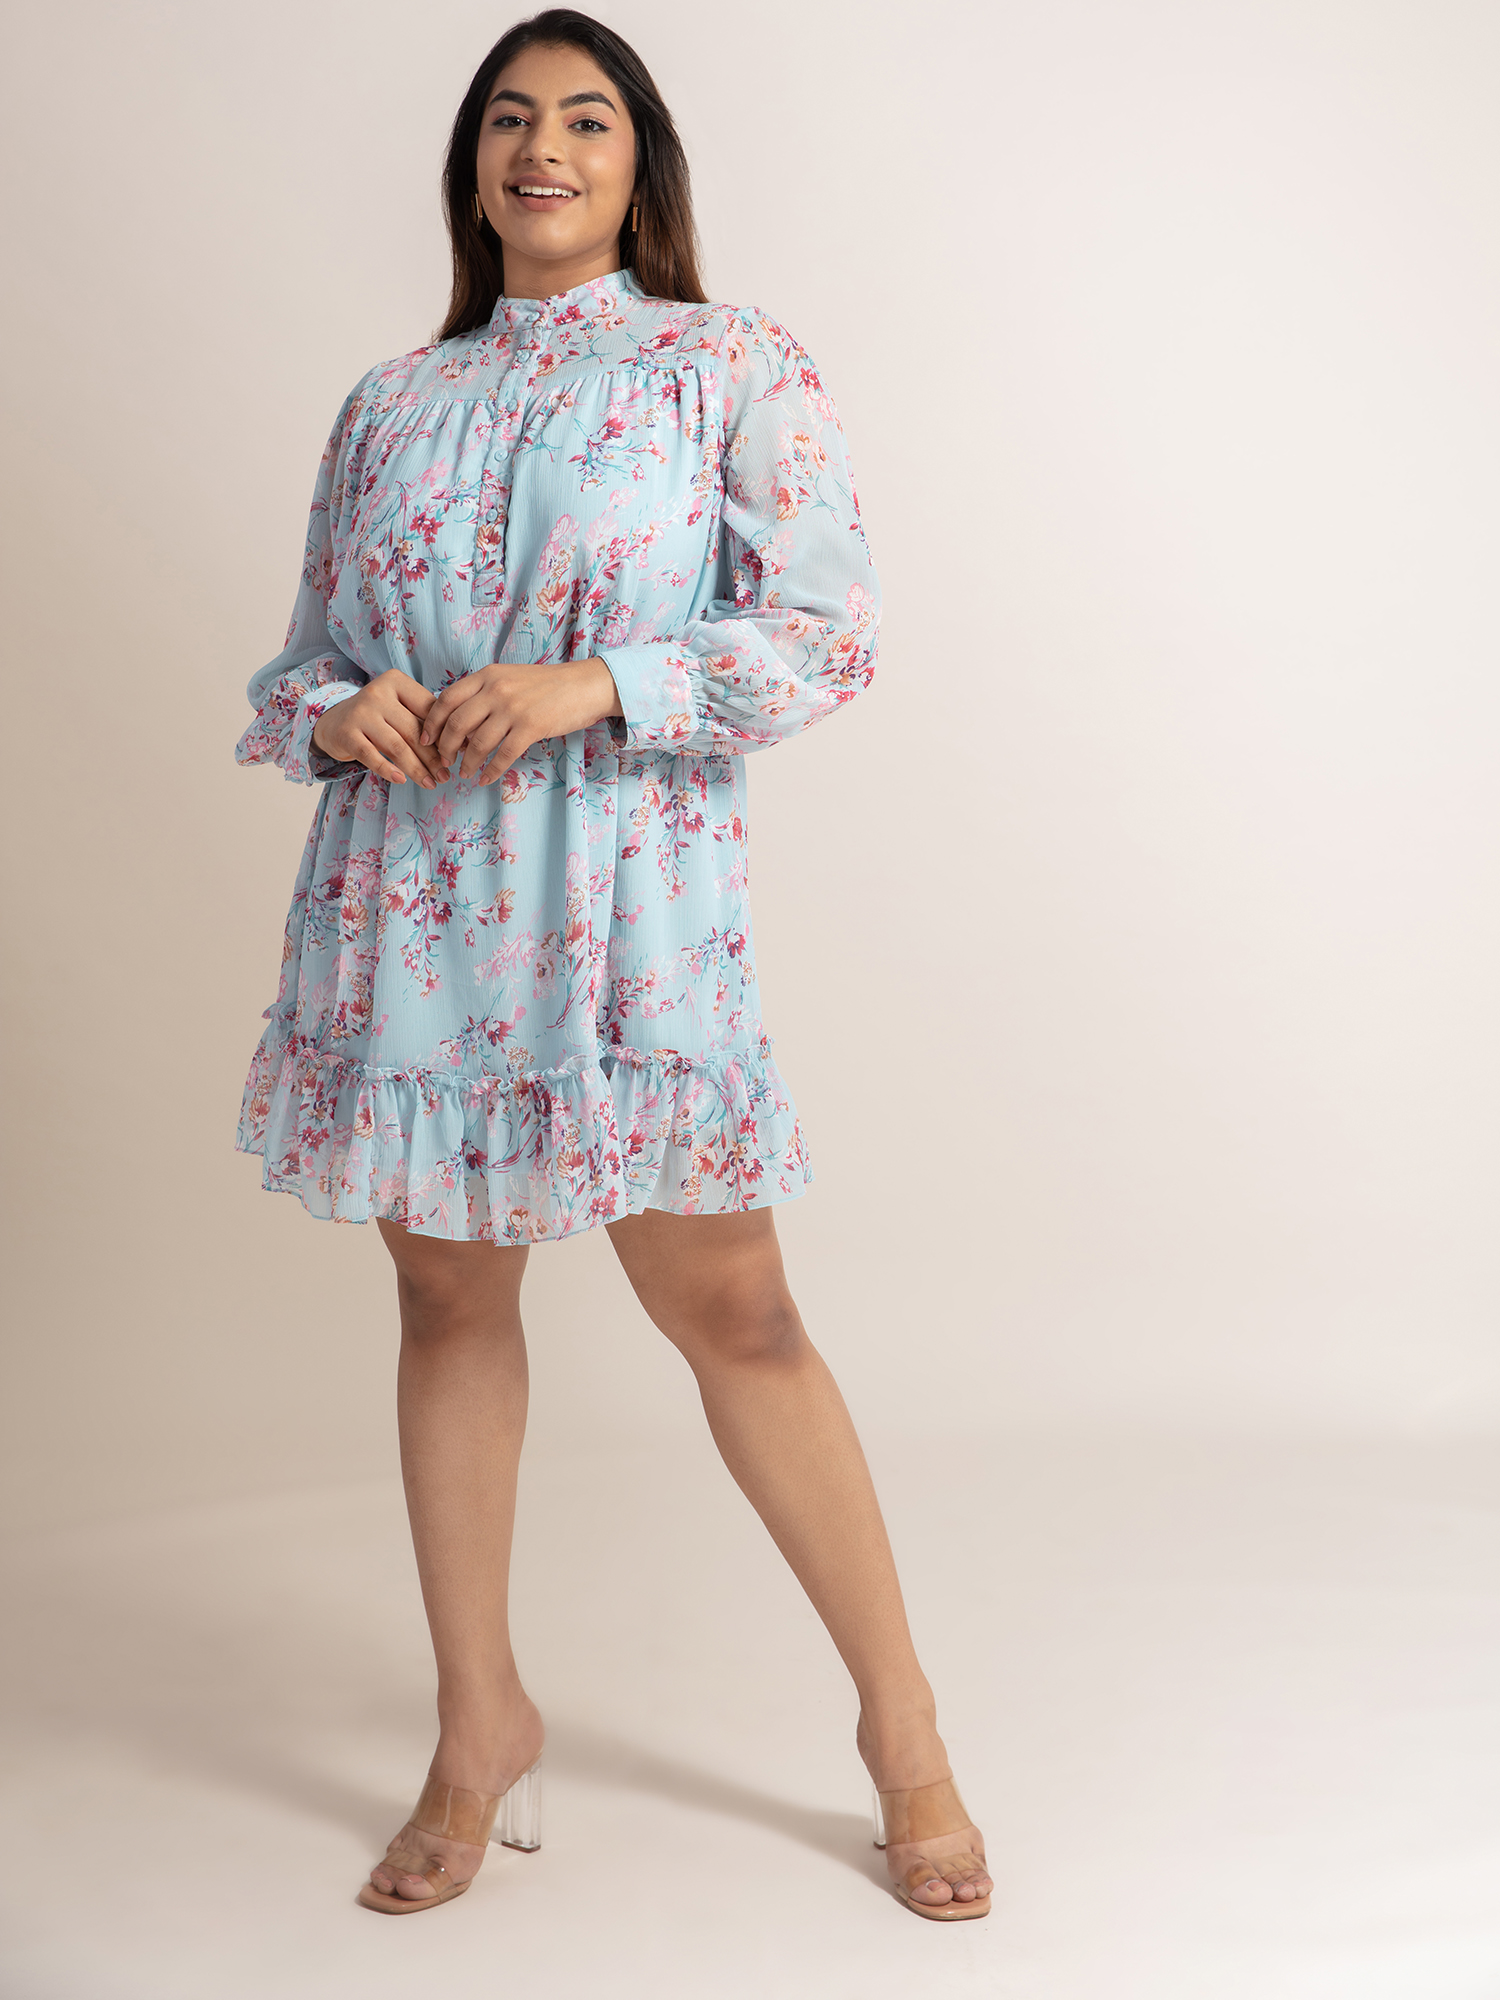 Dresses-Just Springtime Vibes Dress1